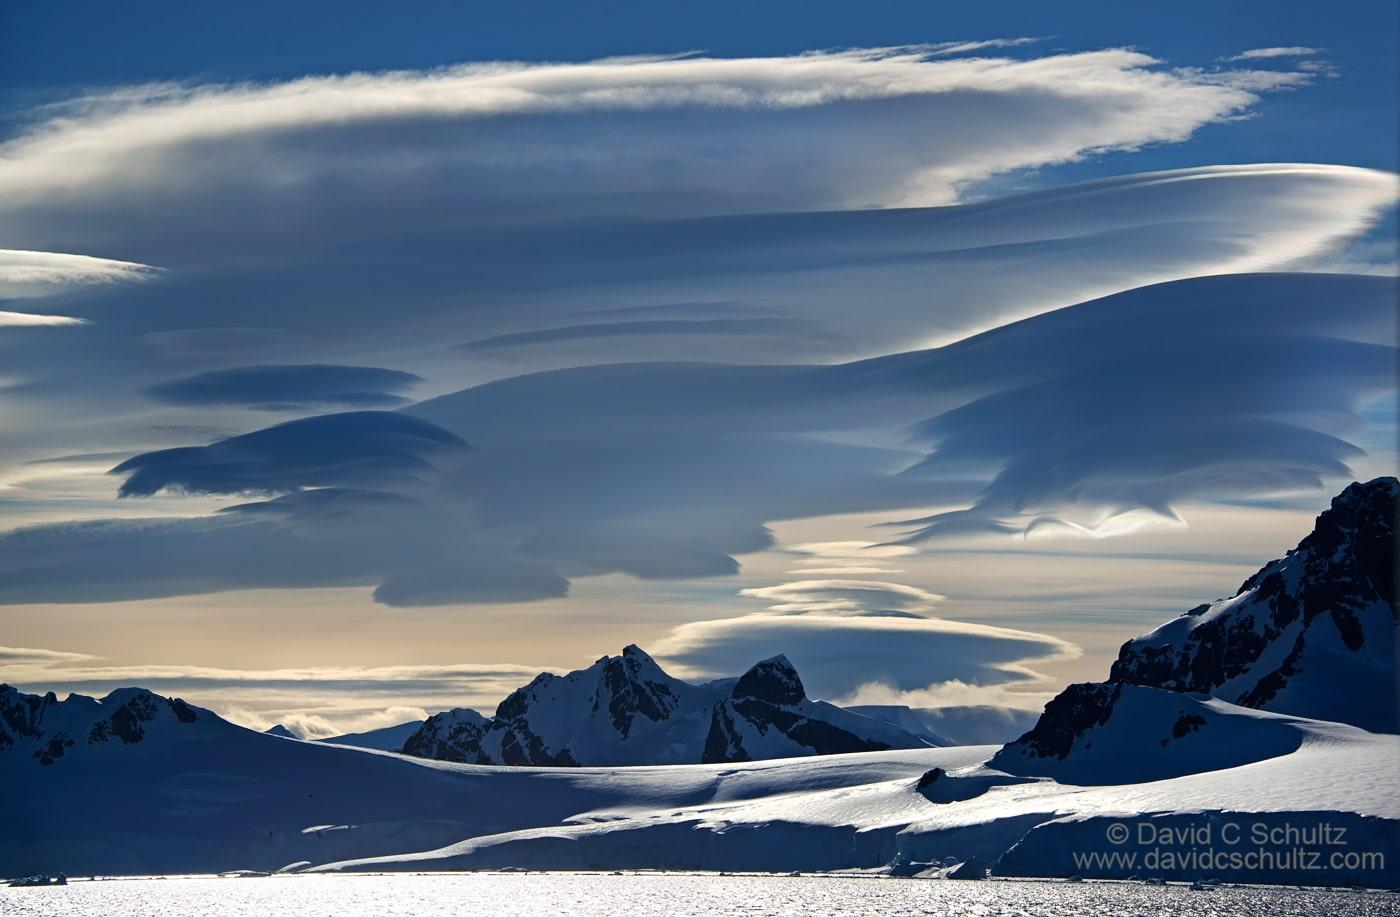 Wallpaper Wallpaper Quotes Antarctica Photo Gallery